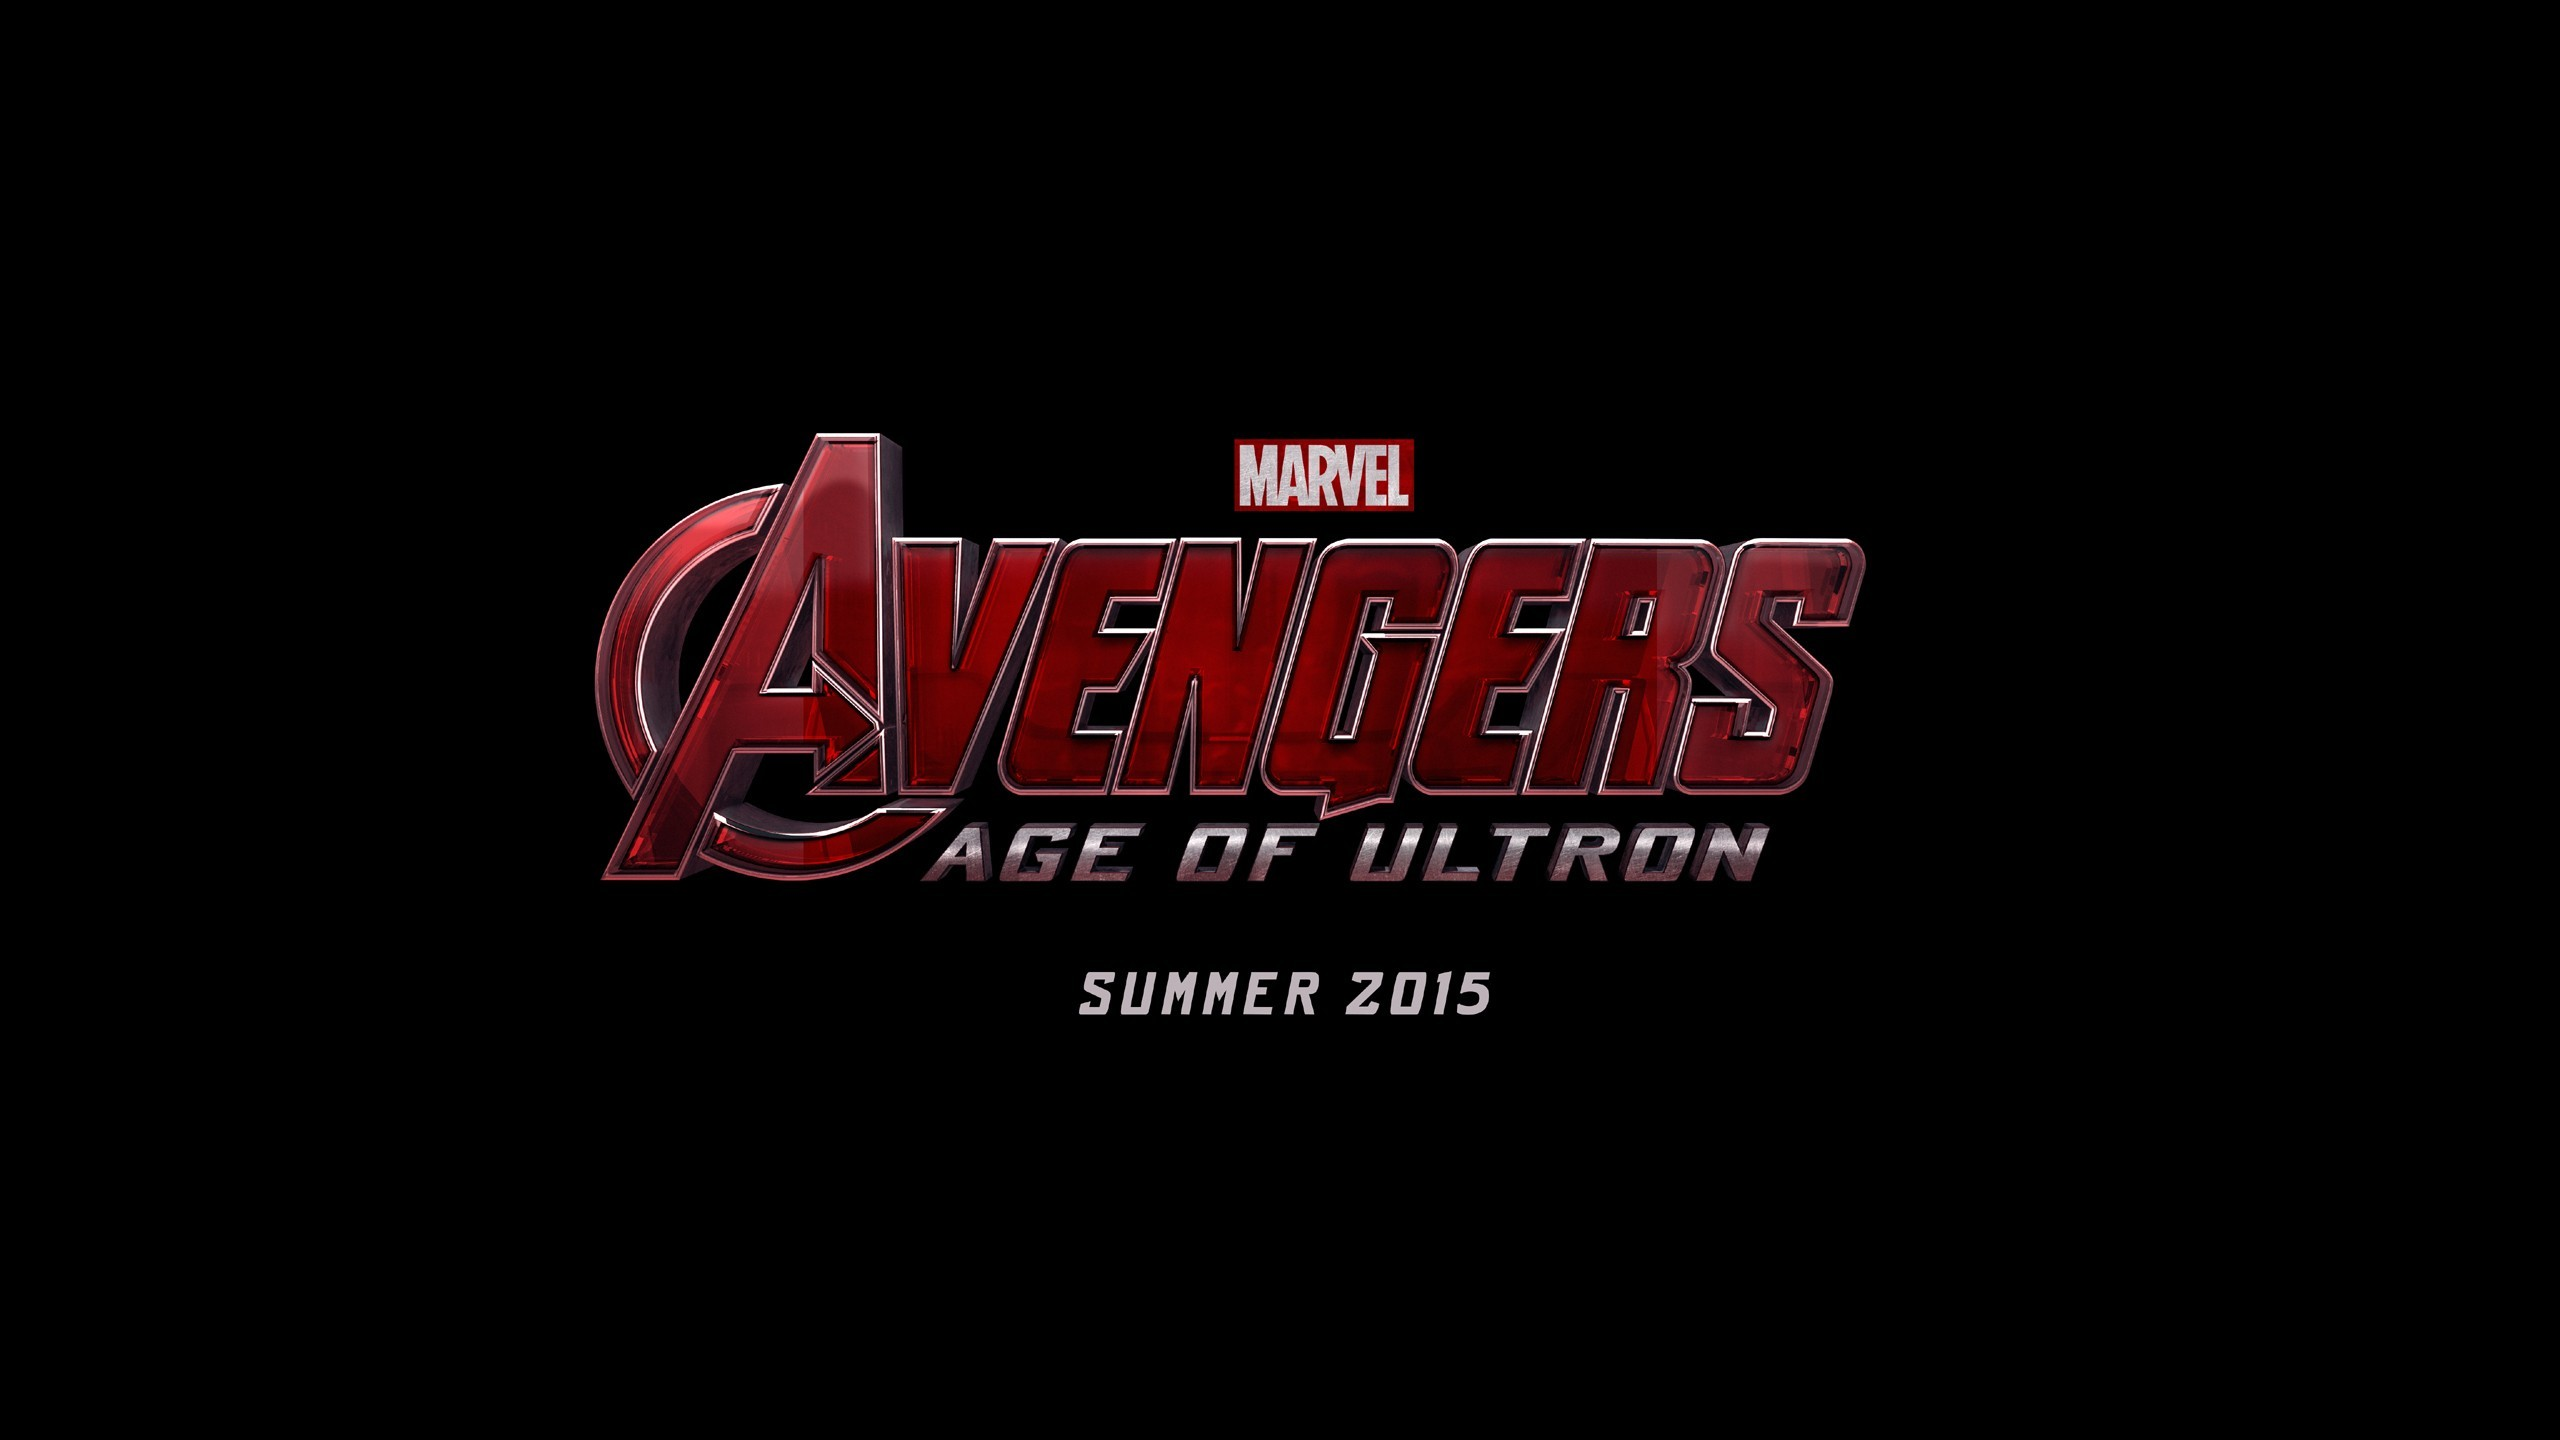 Avengers Age Of Ultron Wallpaper Myconfinedspace